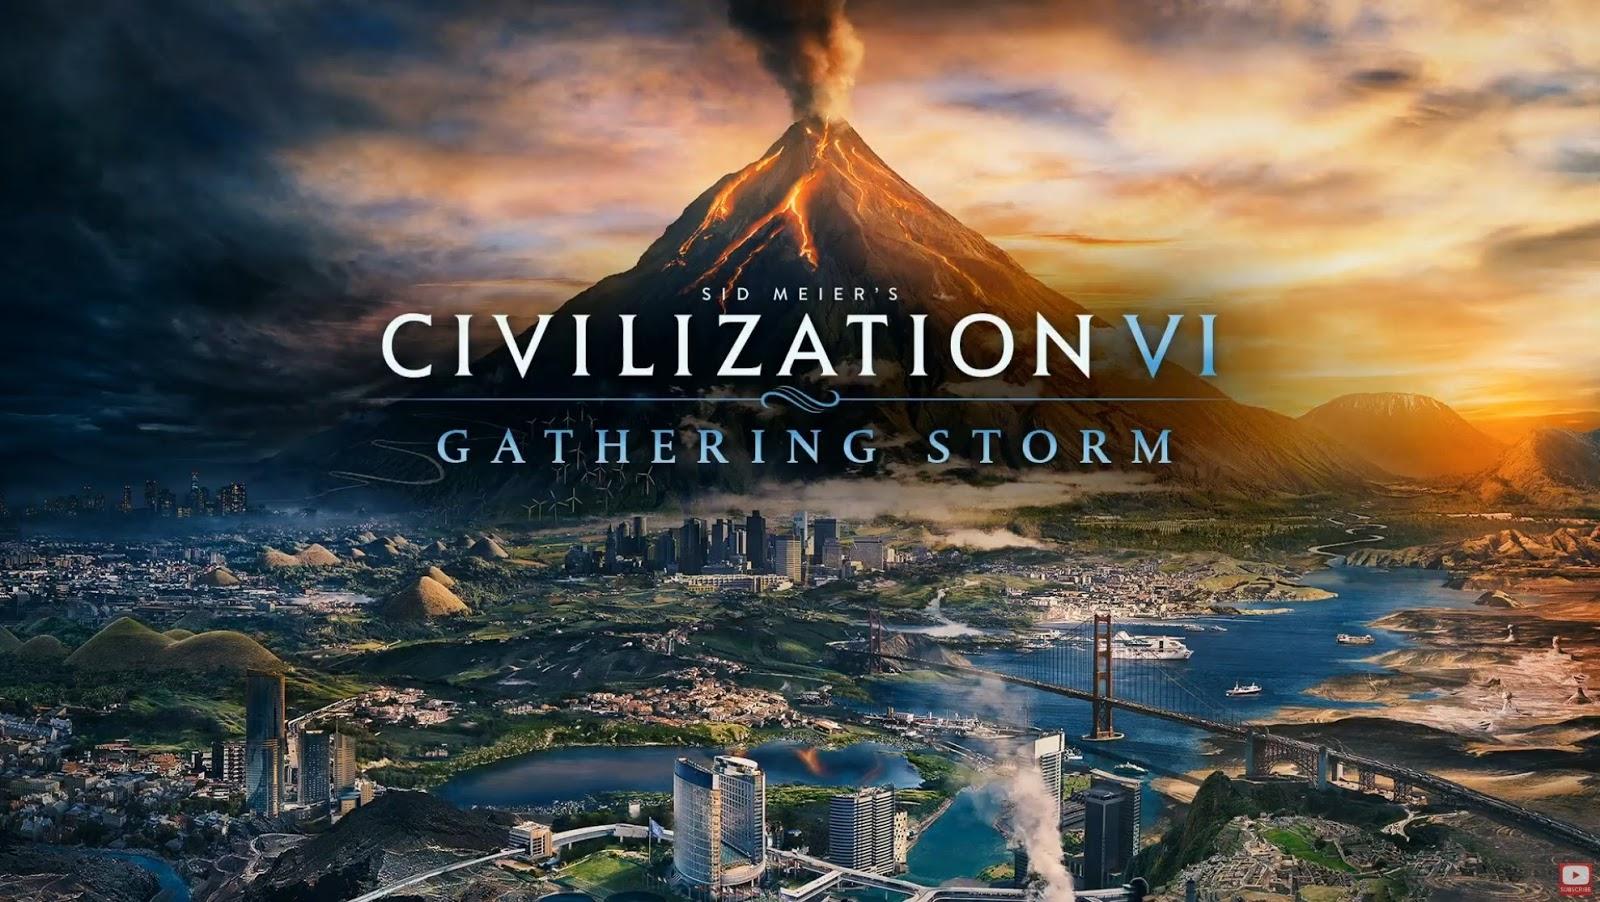 sid-meiers-civilization-vi-gathering-storm